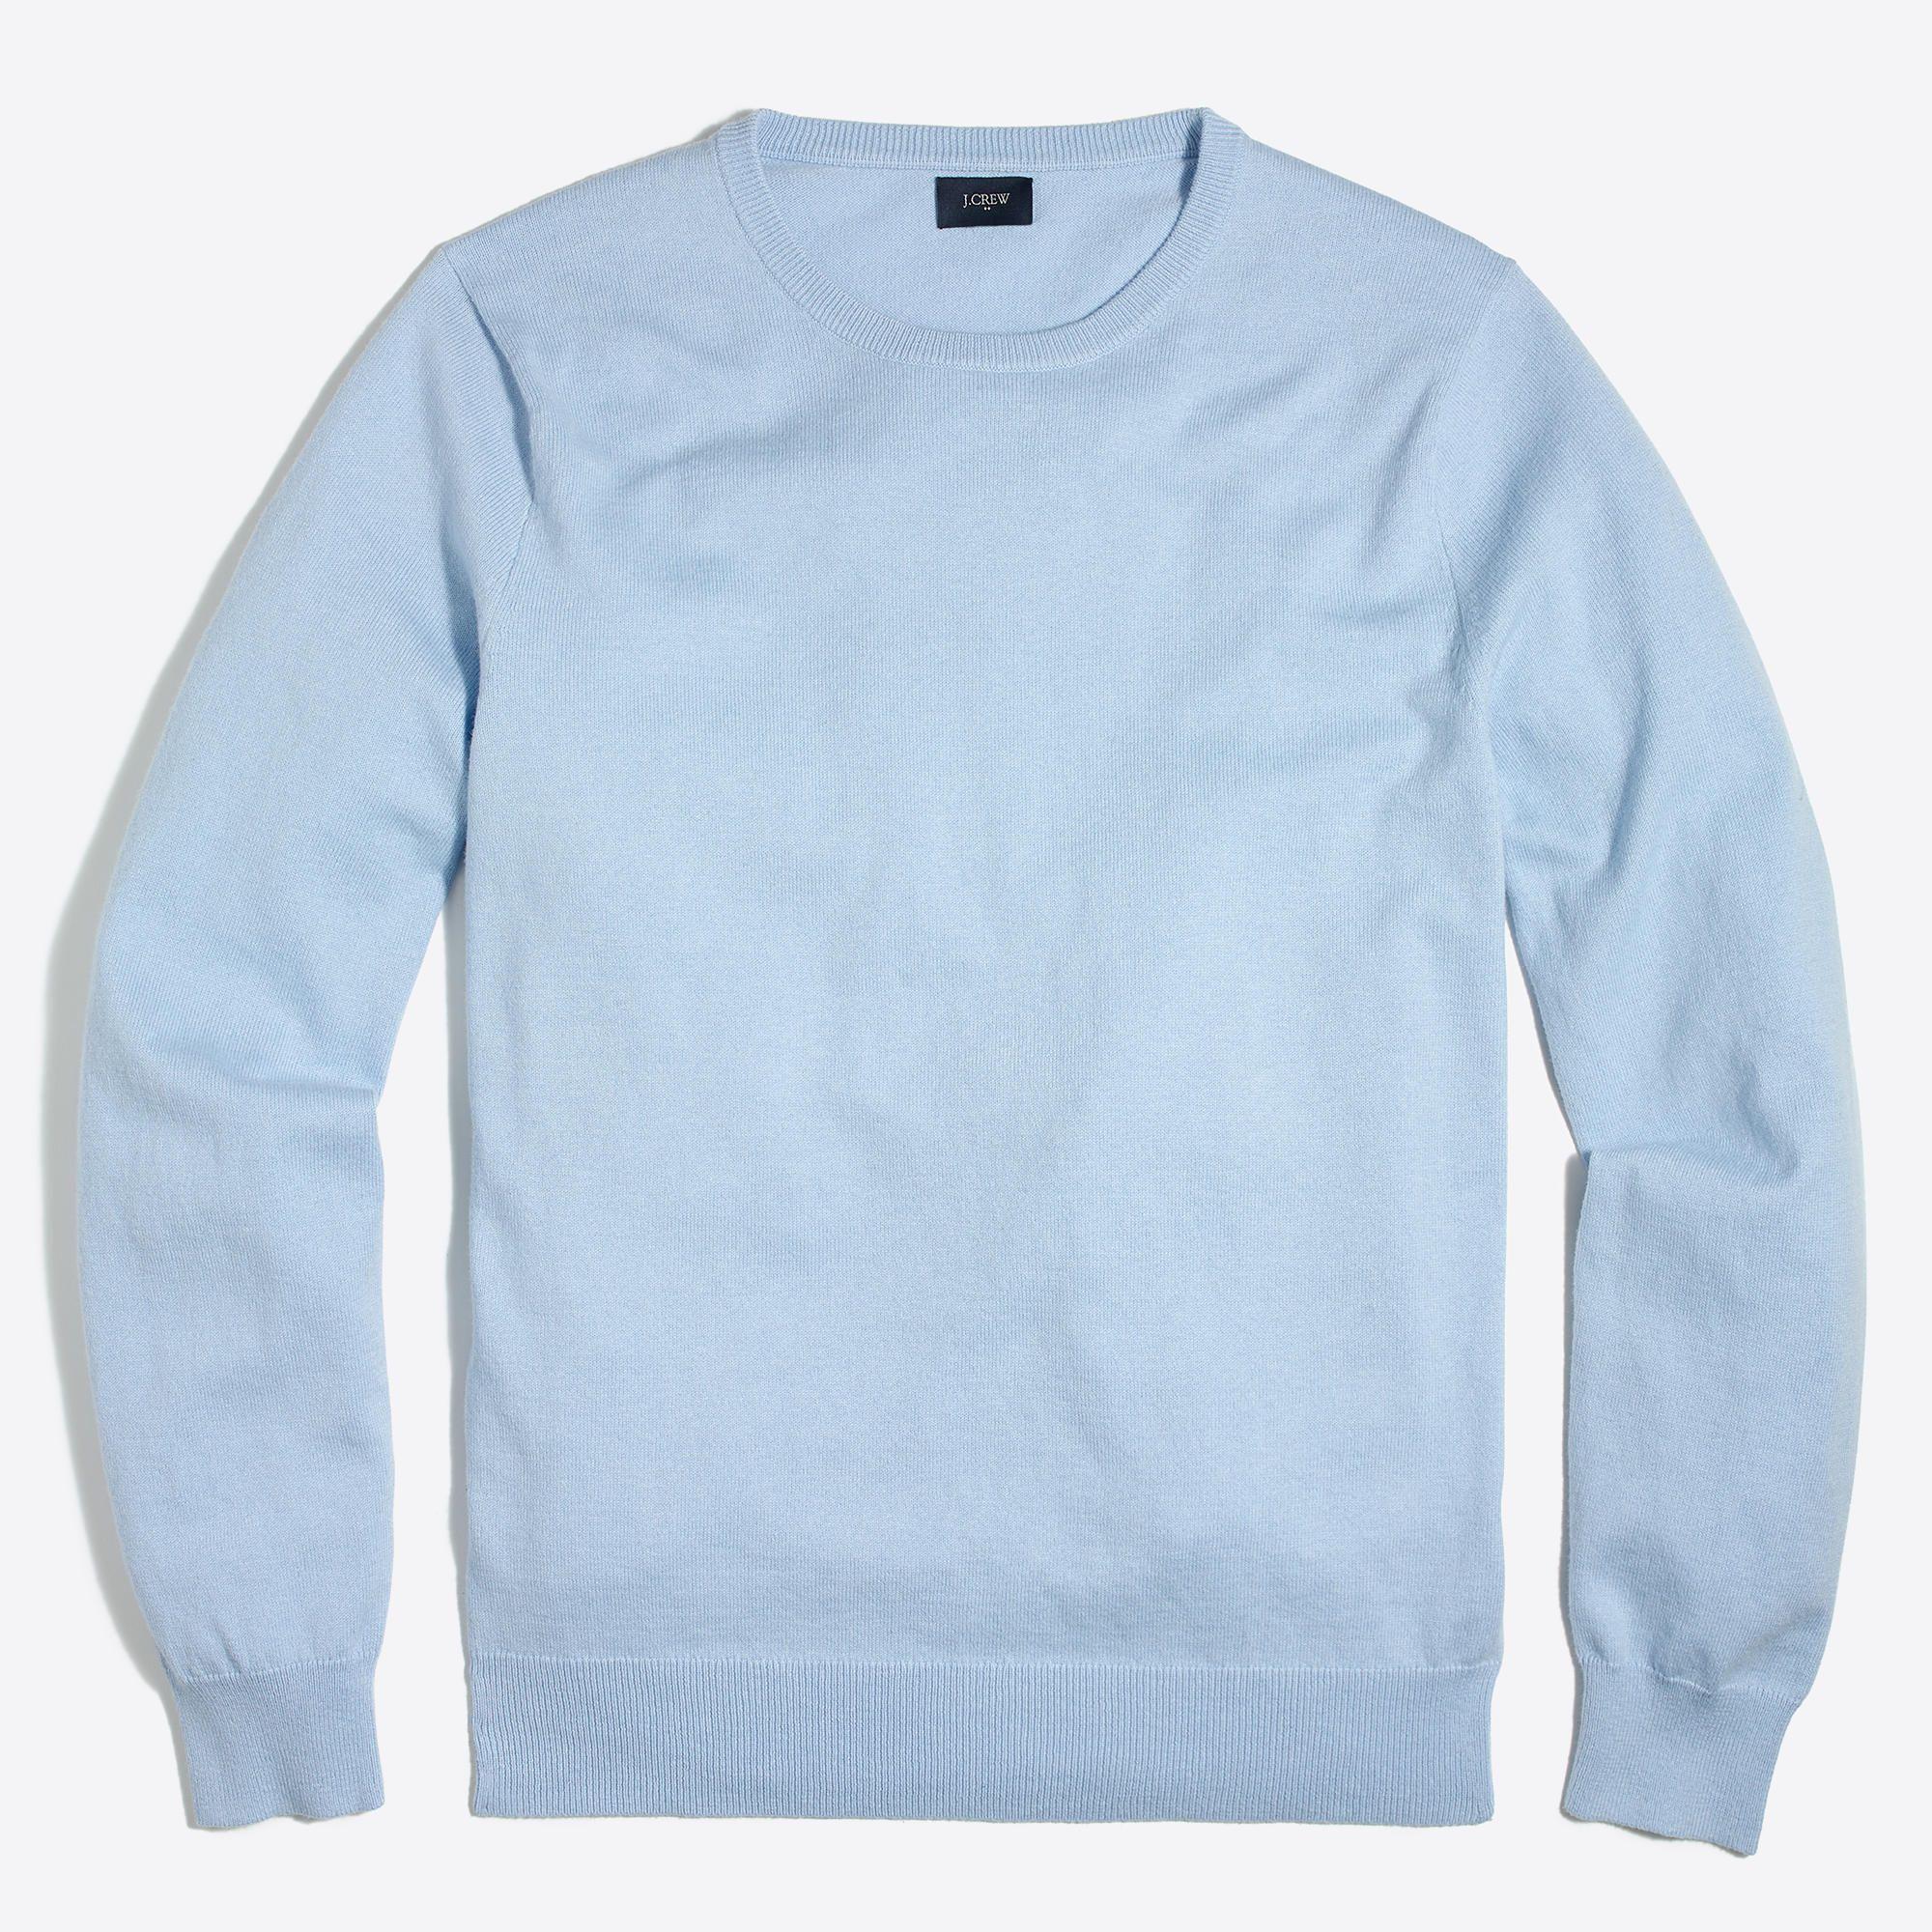 J.Crew Factory Hthr Sky | Crewneck sweaters